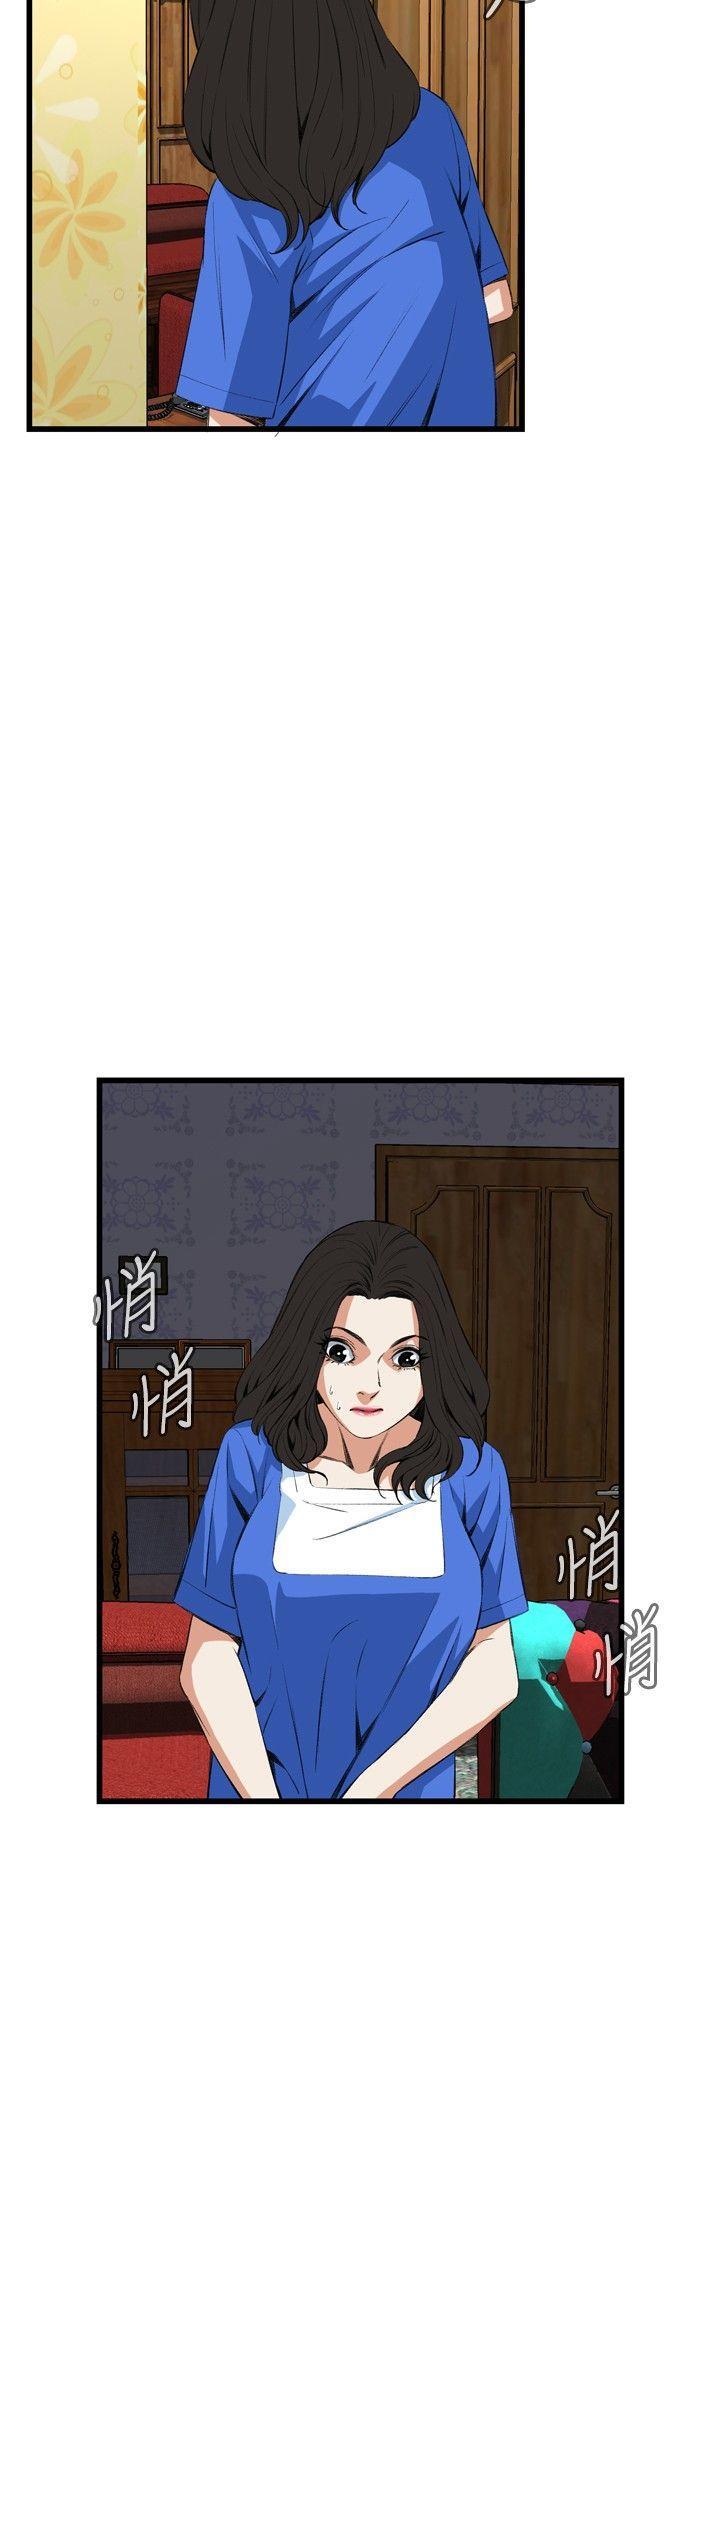 Take a Peek 偷窥 Ch.39~55 [Chinese]中文 509